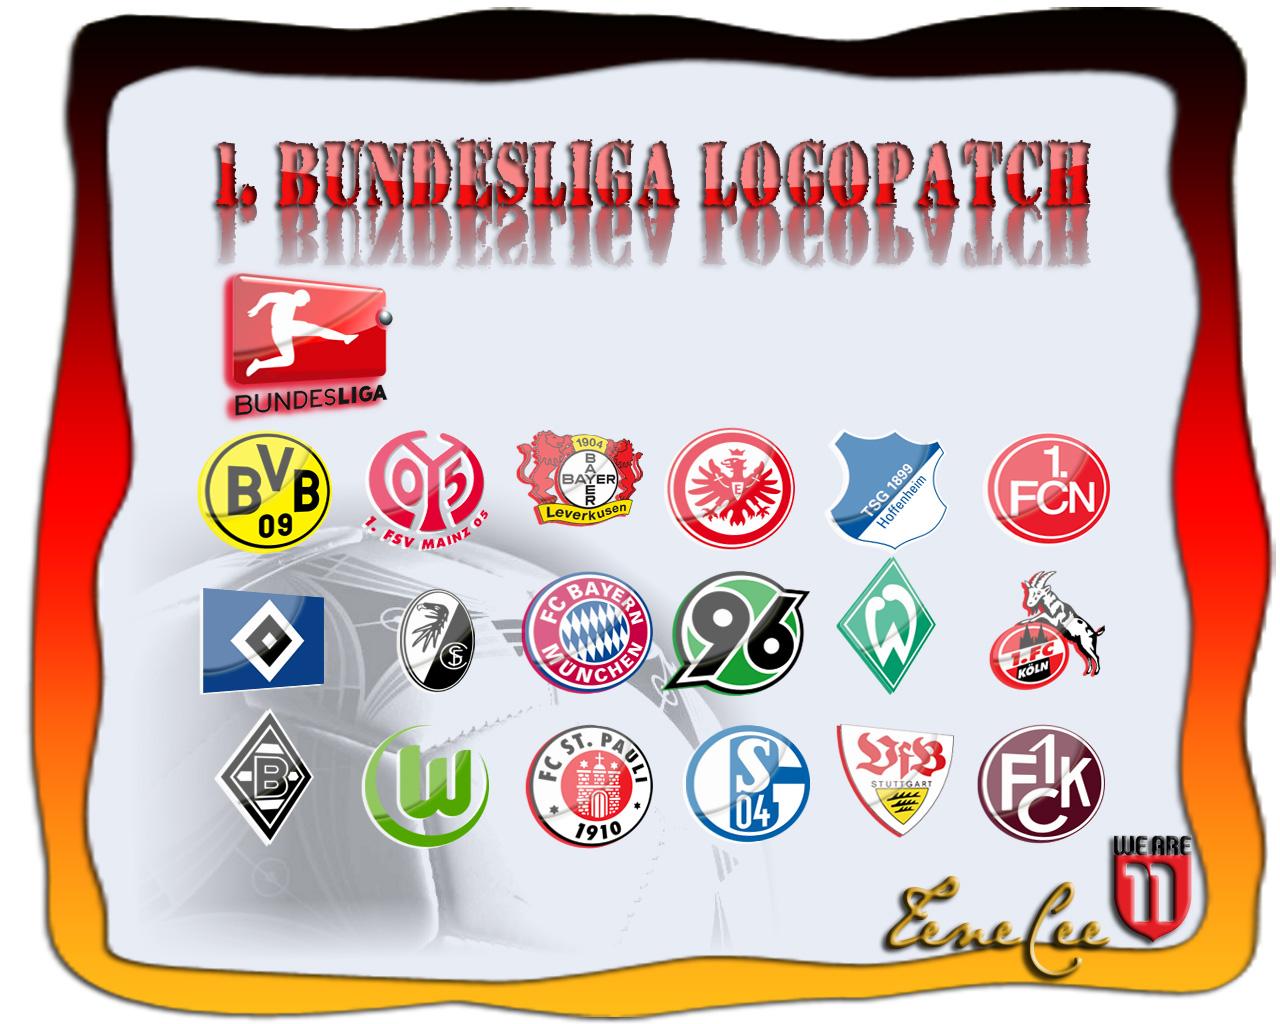 Nfl Team Logos And Names Nfl Team Logo Vector